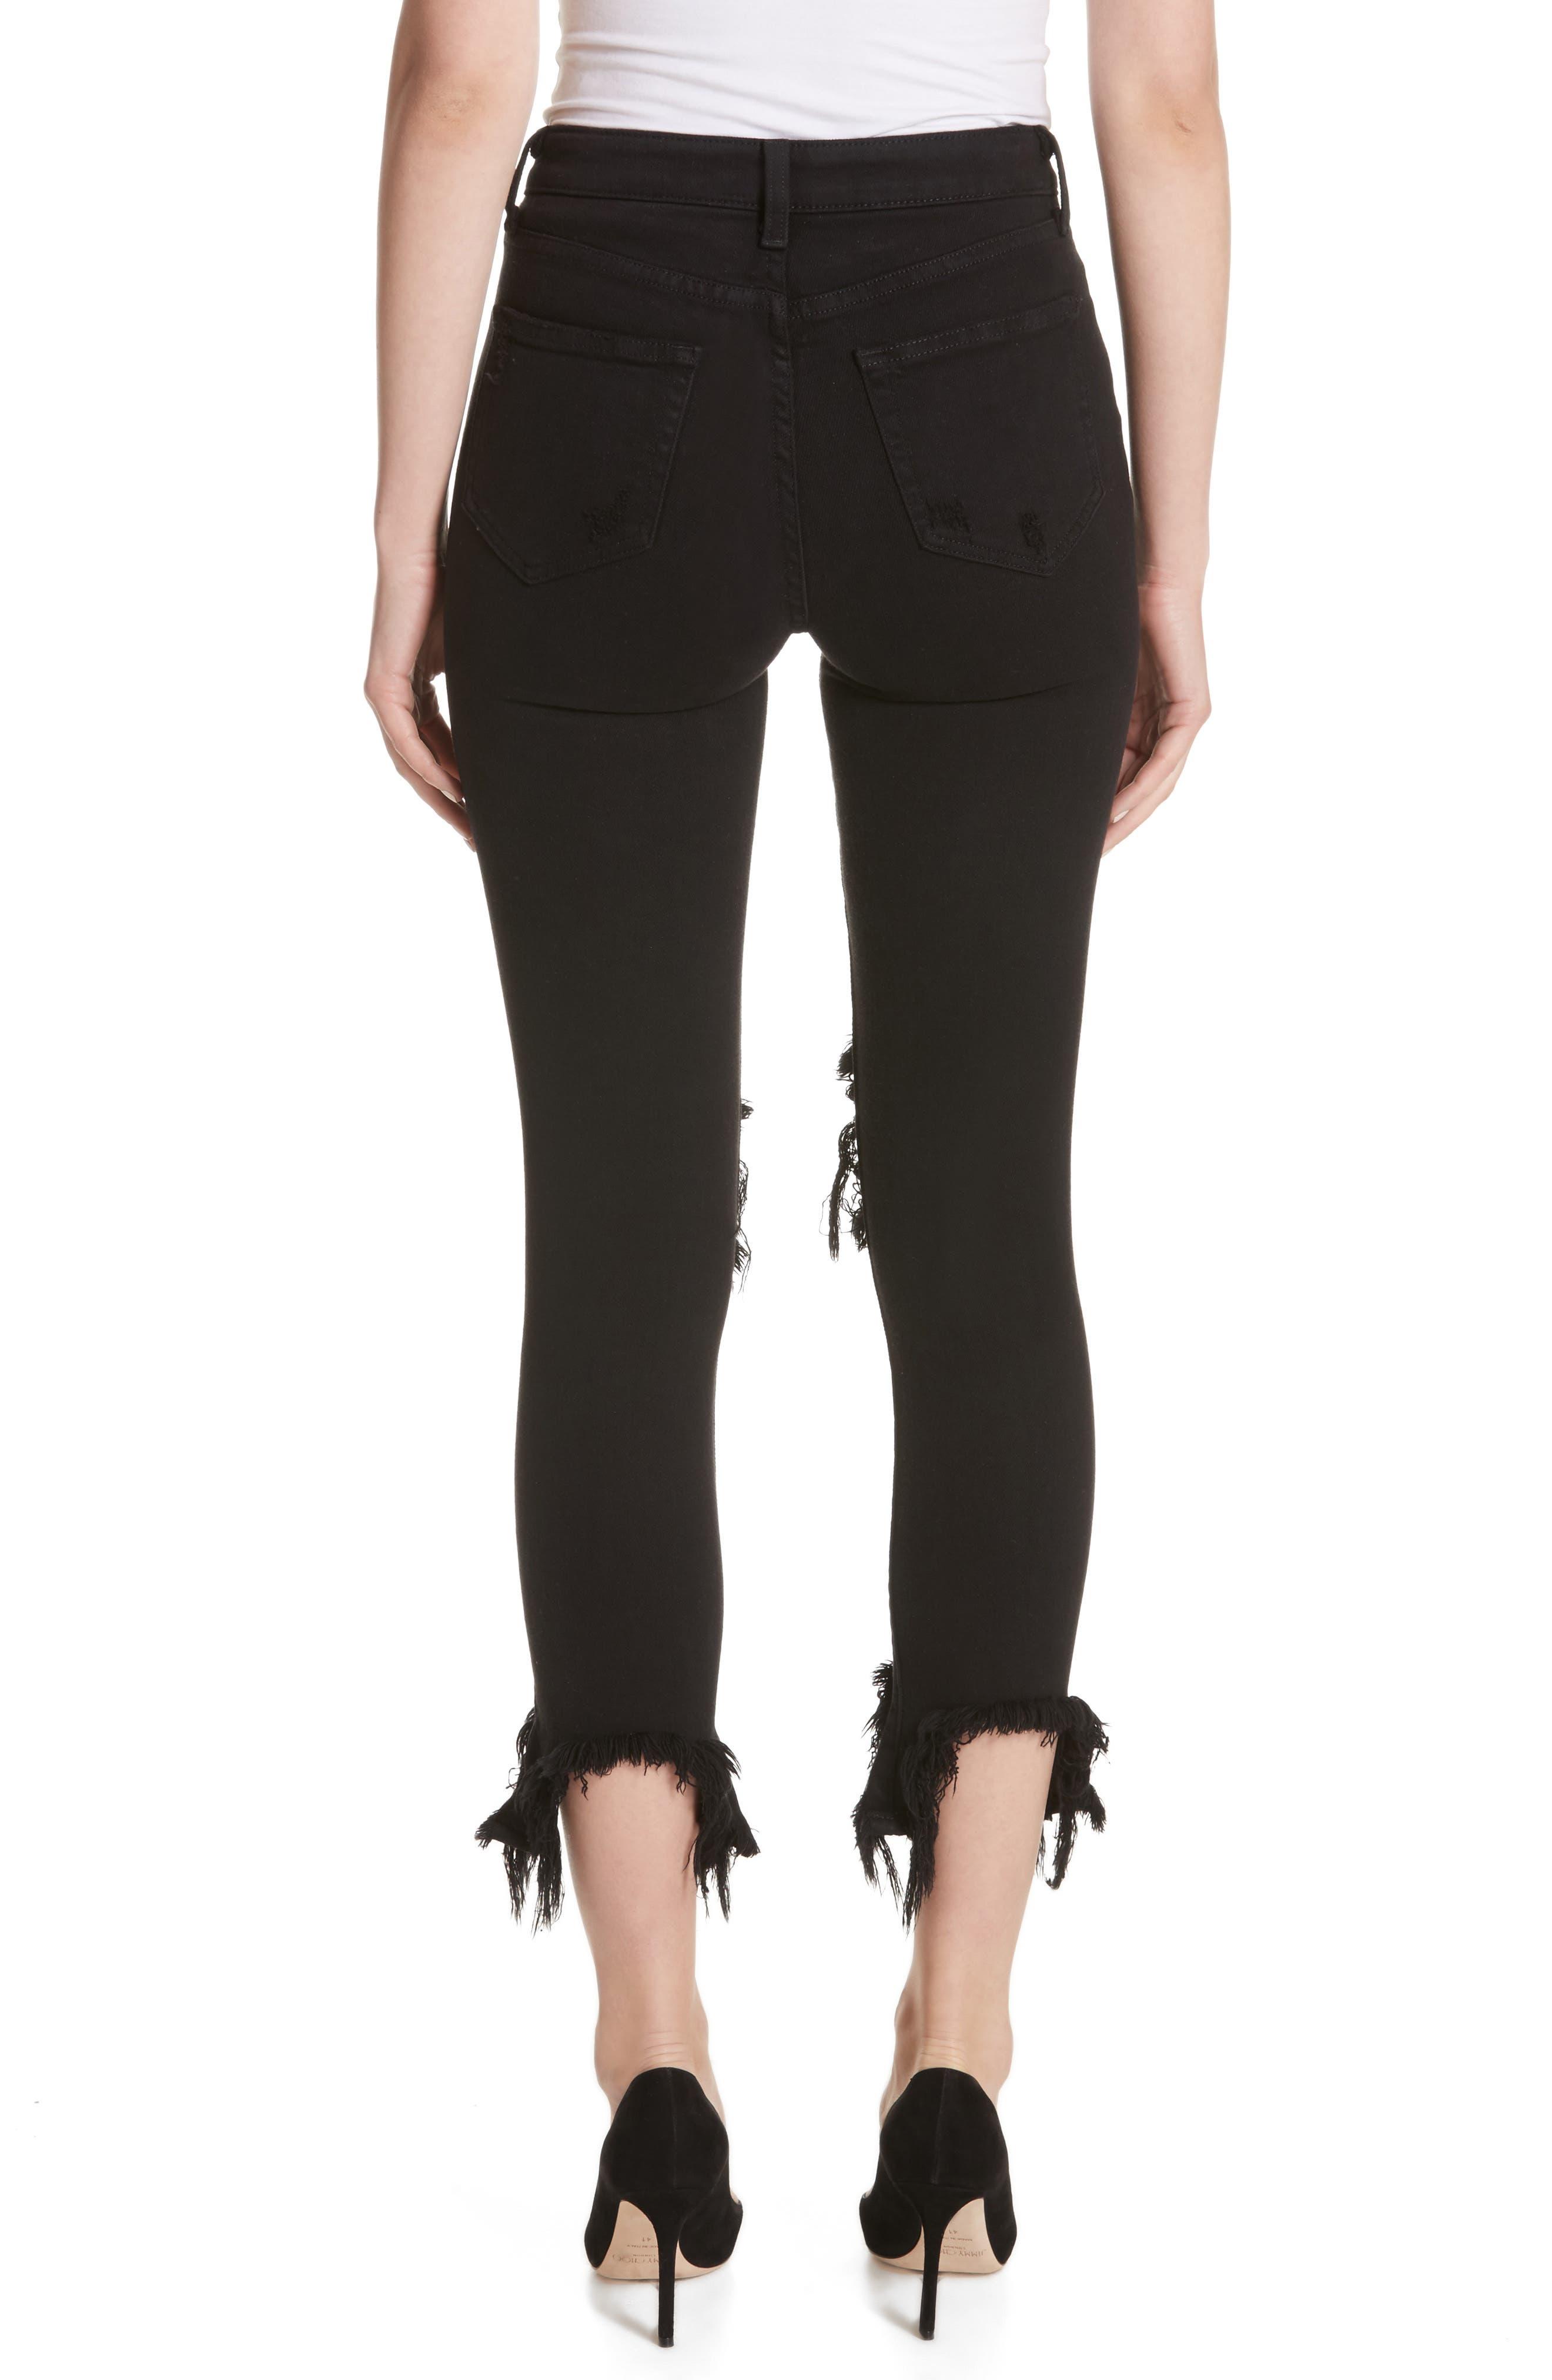 L'AGENCE, Highline High Waist Fray Hem Skinny Jeans, Alternate thumbnail 2, color, SATURATED BLACK DESTRUCT